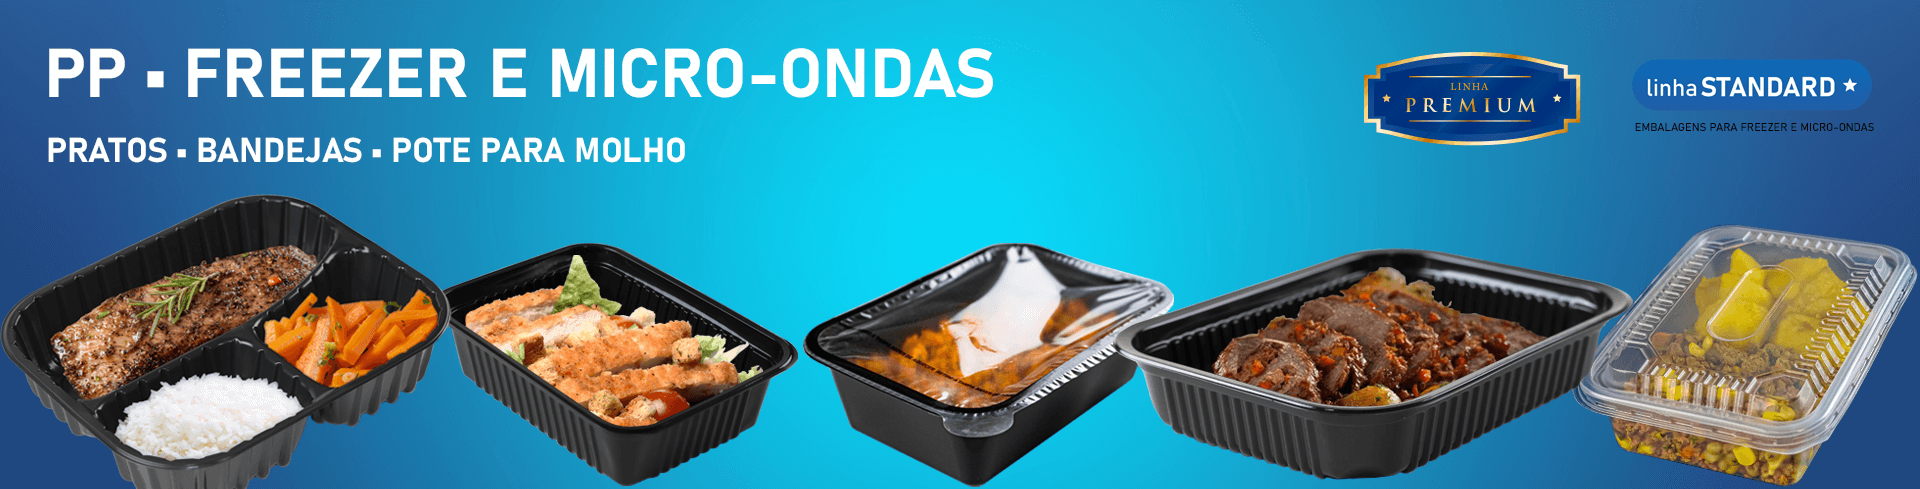 marmita para freezer e micro-ondas